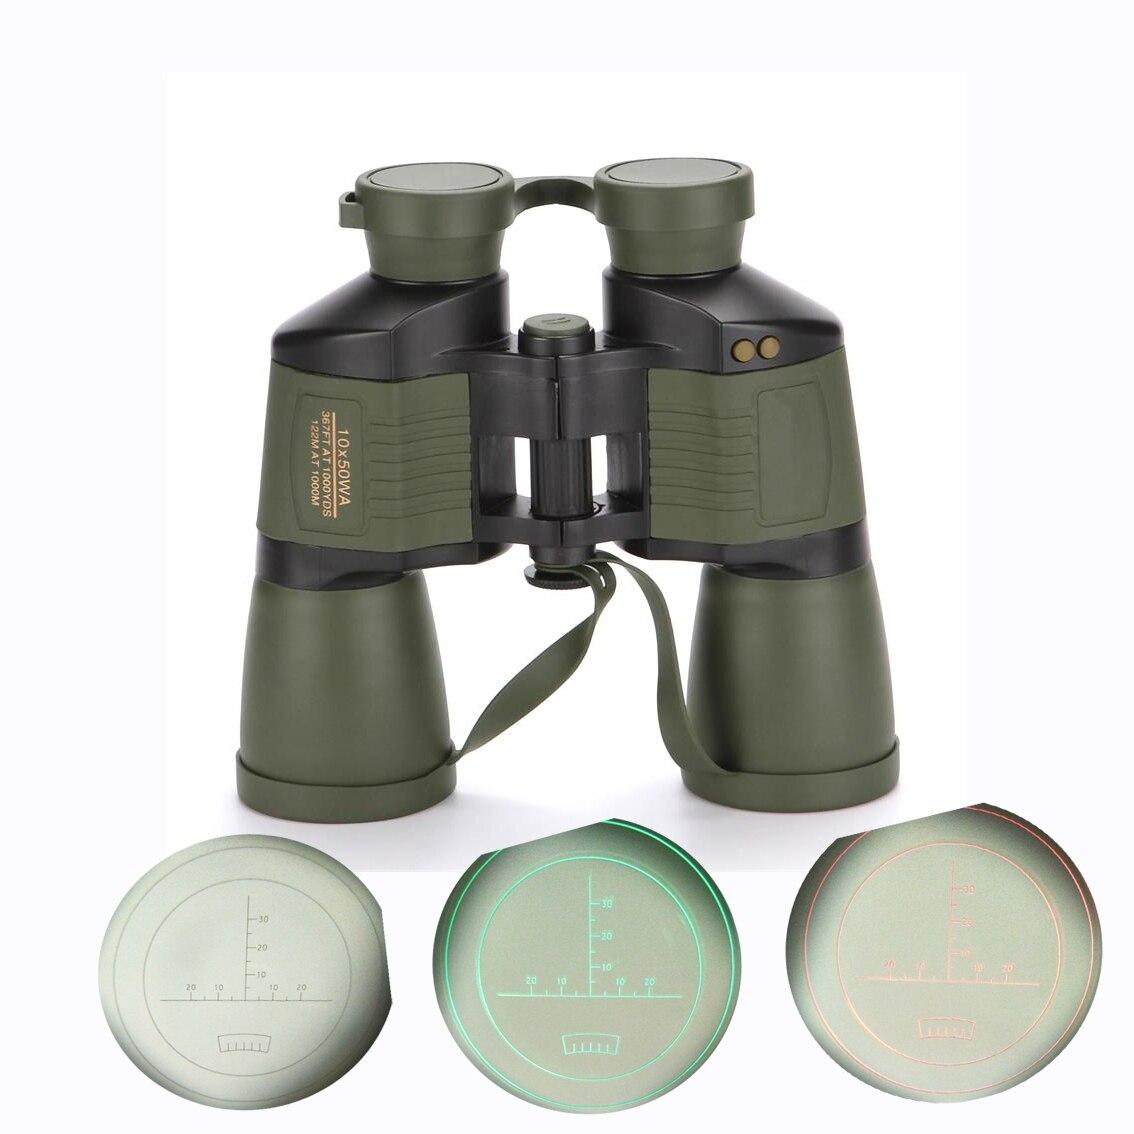 HD Brand 10X50 Auto focus waterproof rangefinder binoculars telescope hunting tourism optical outdoor sports eyepiece binoculars Бинокль